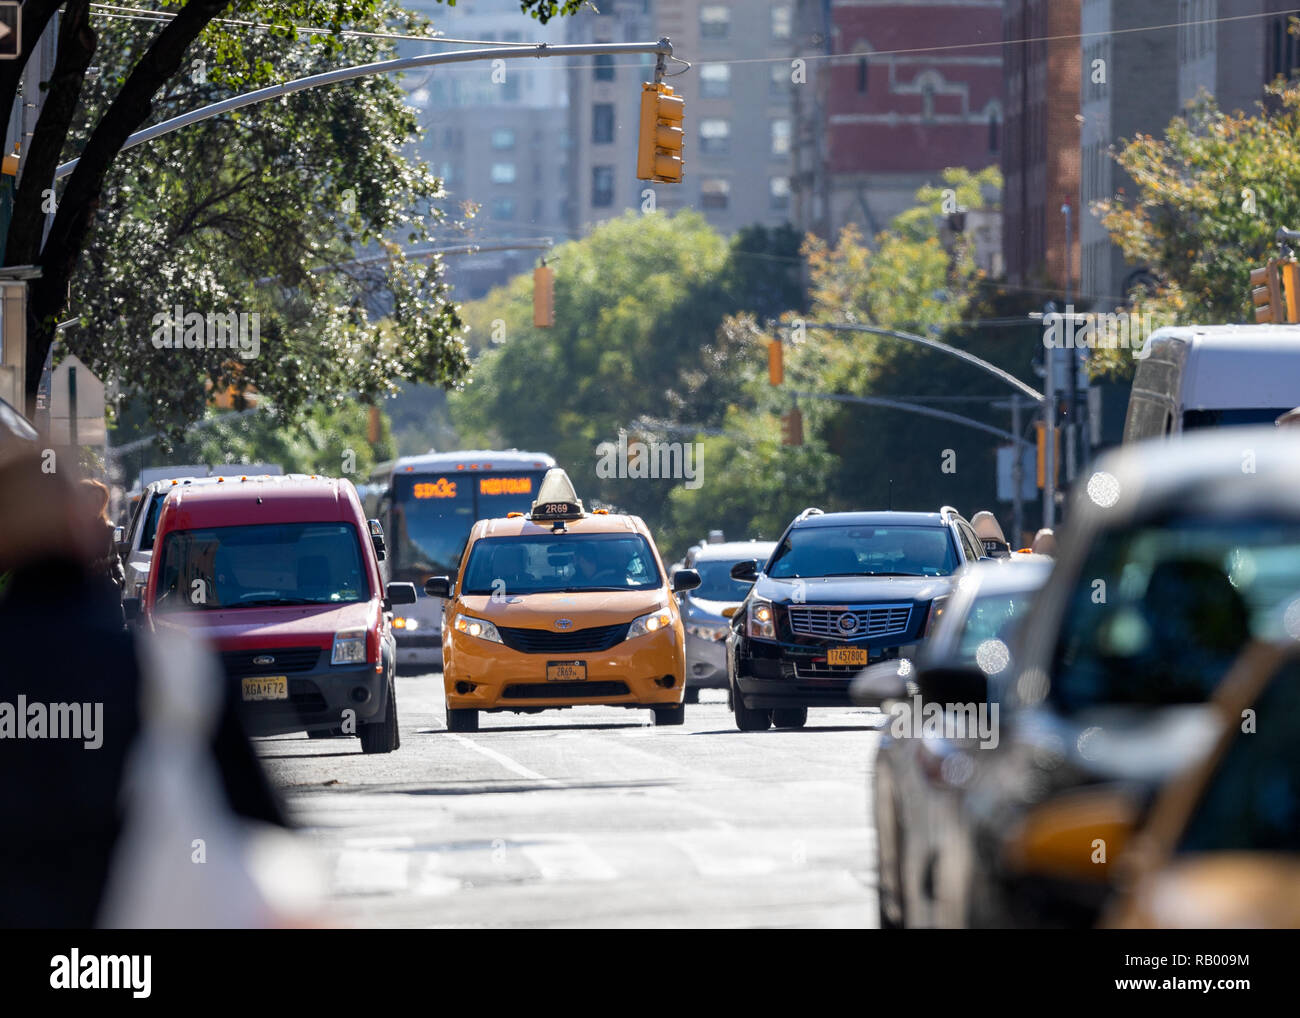 Cars on 6th Aveenue, Manhattan, Newy York City, NY, US - Stock Image